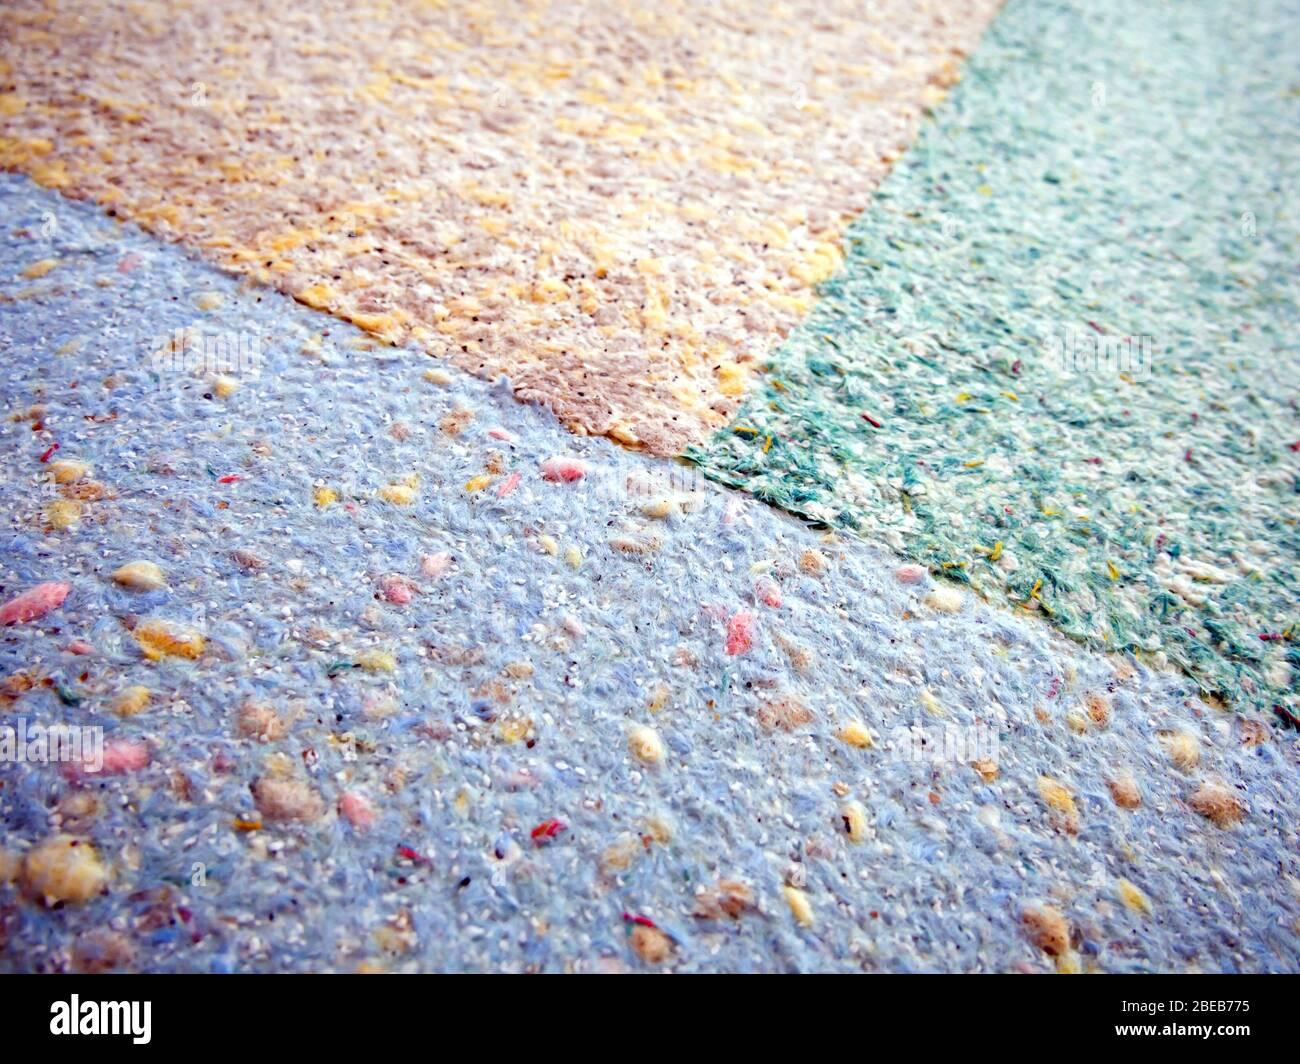 Pittura Granulosa Per Cartongesso intonaco liquido immagini & intonaco liquido fotos stock - alamy